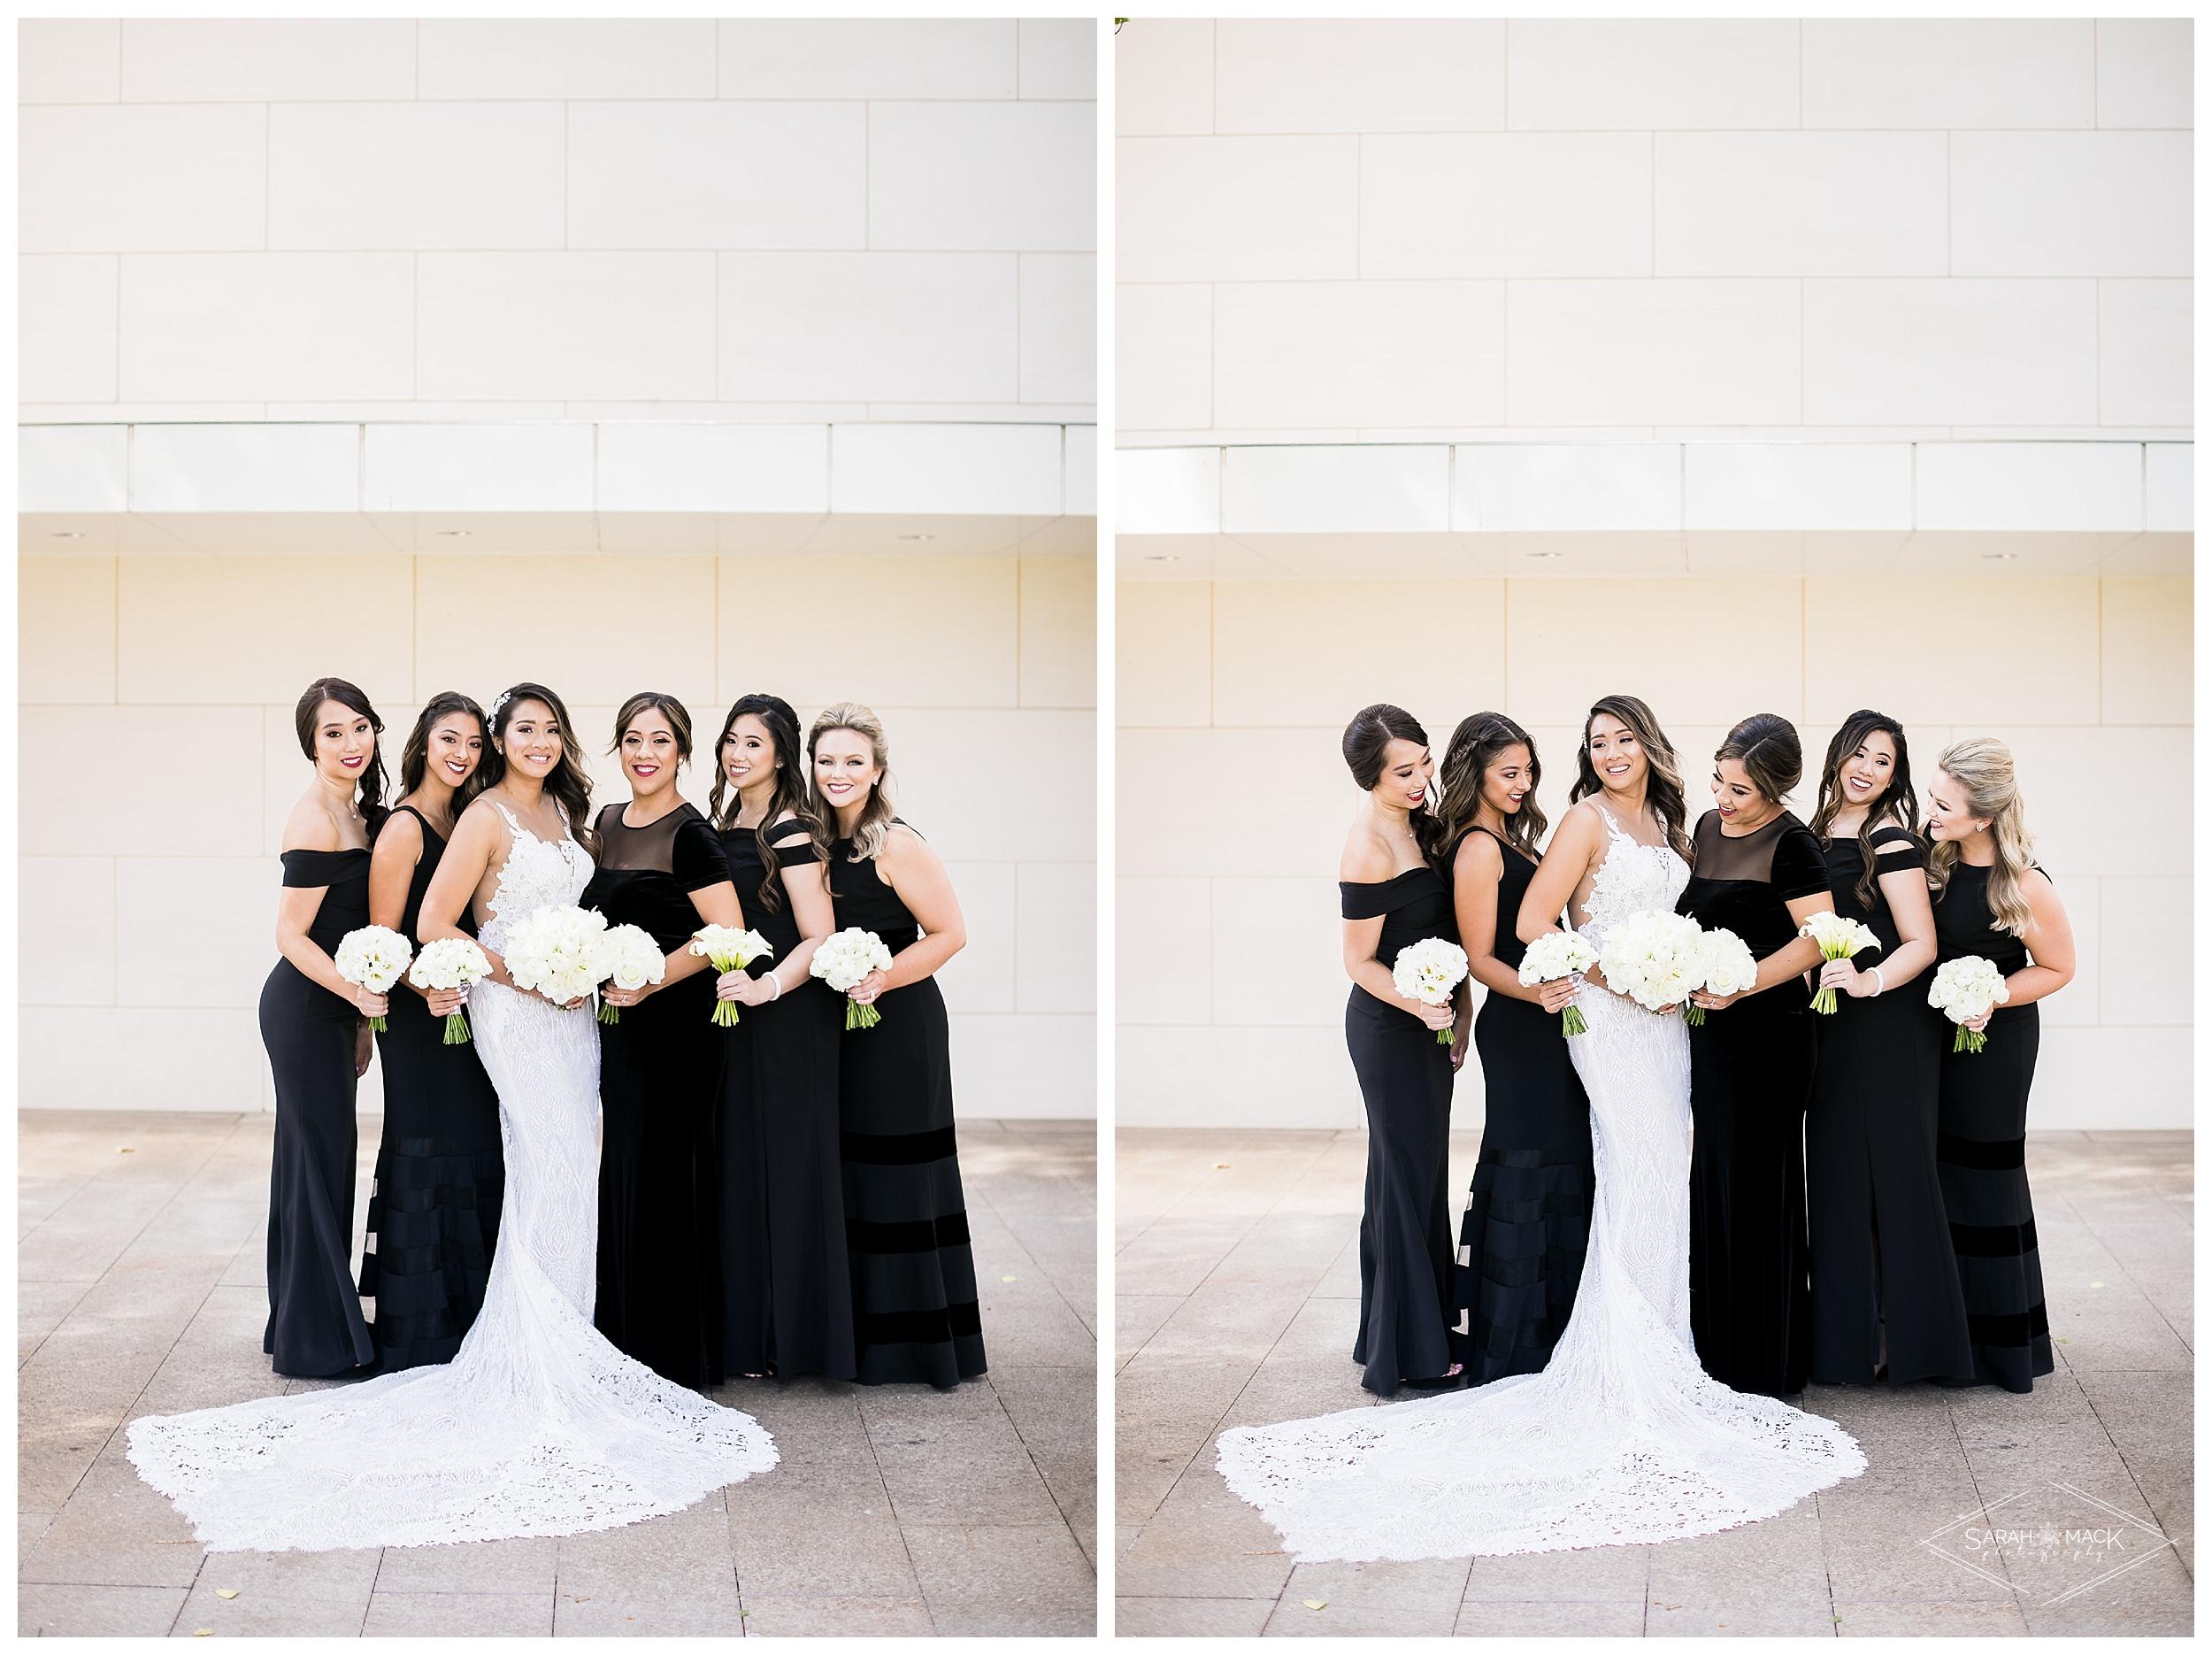 LE-Avenue-of-the-Arts-Costa-Mesa-Wedding-Photography-0096.jpg